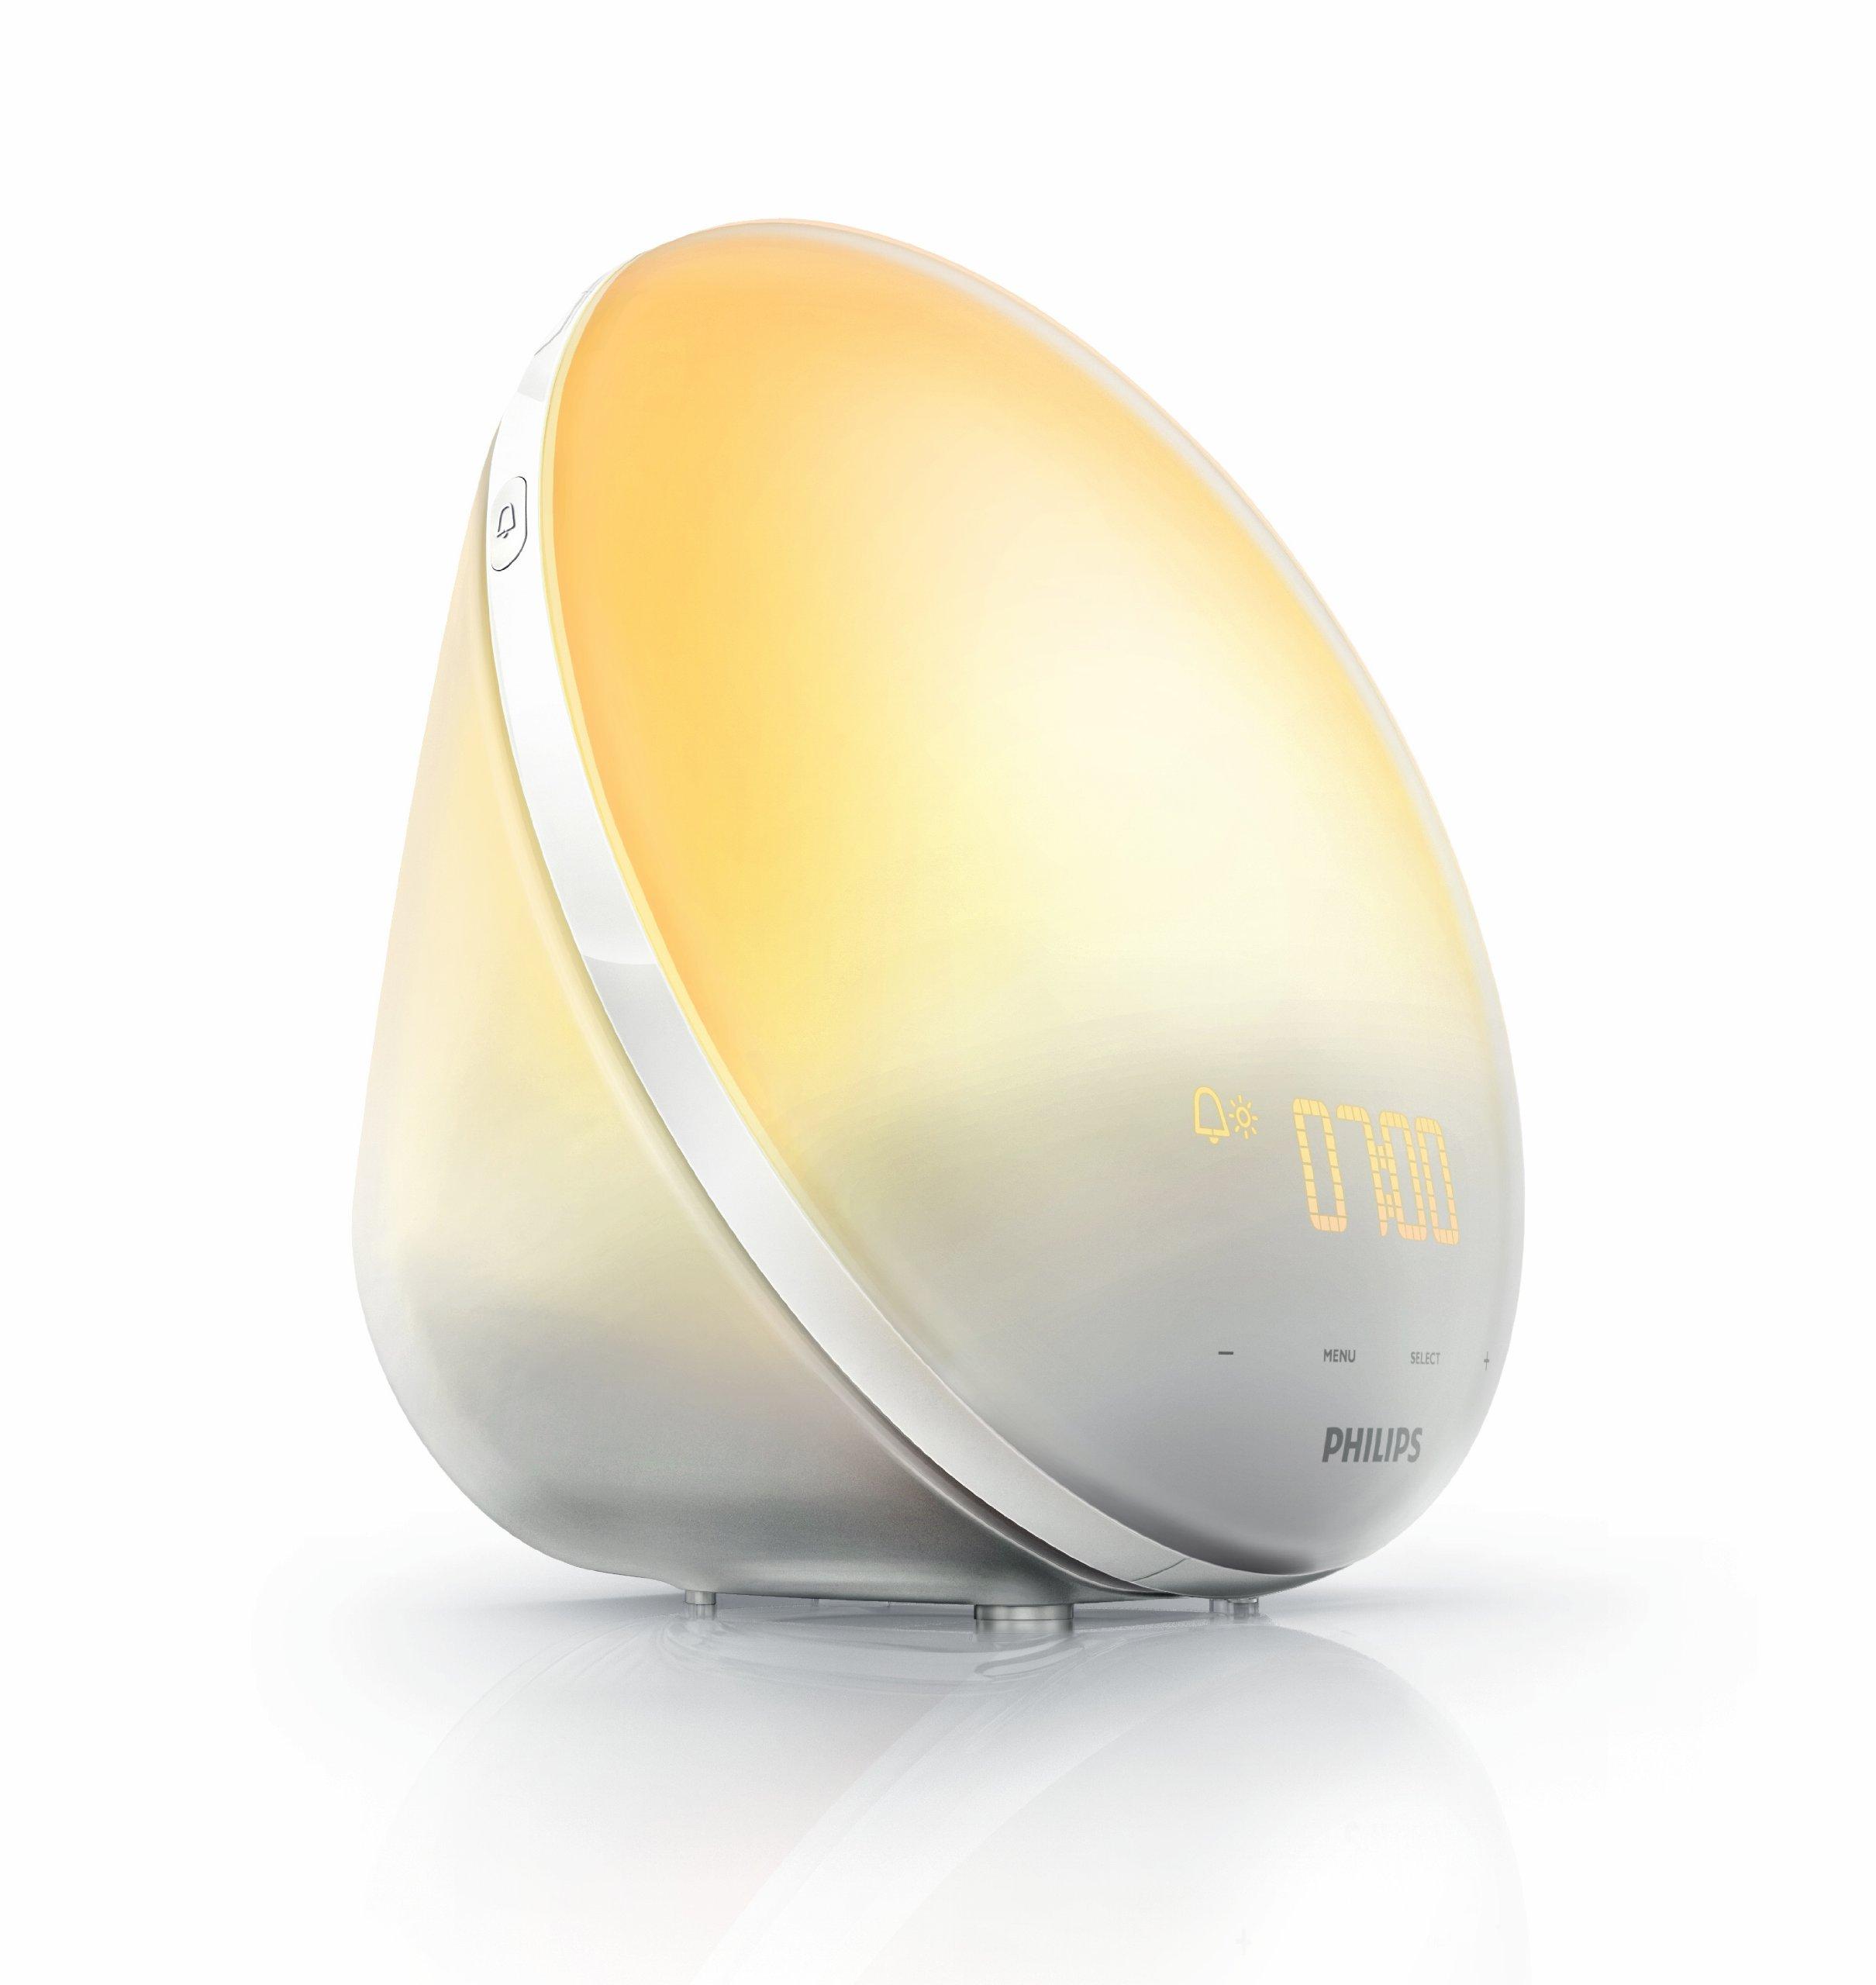 Philips Wake-Up Light Alarm Clock HF3510/01 with Sunrise Simulation - 3 Sounds and Radio Function product image